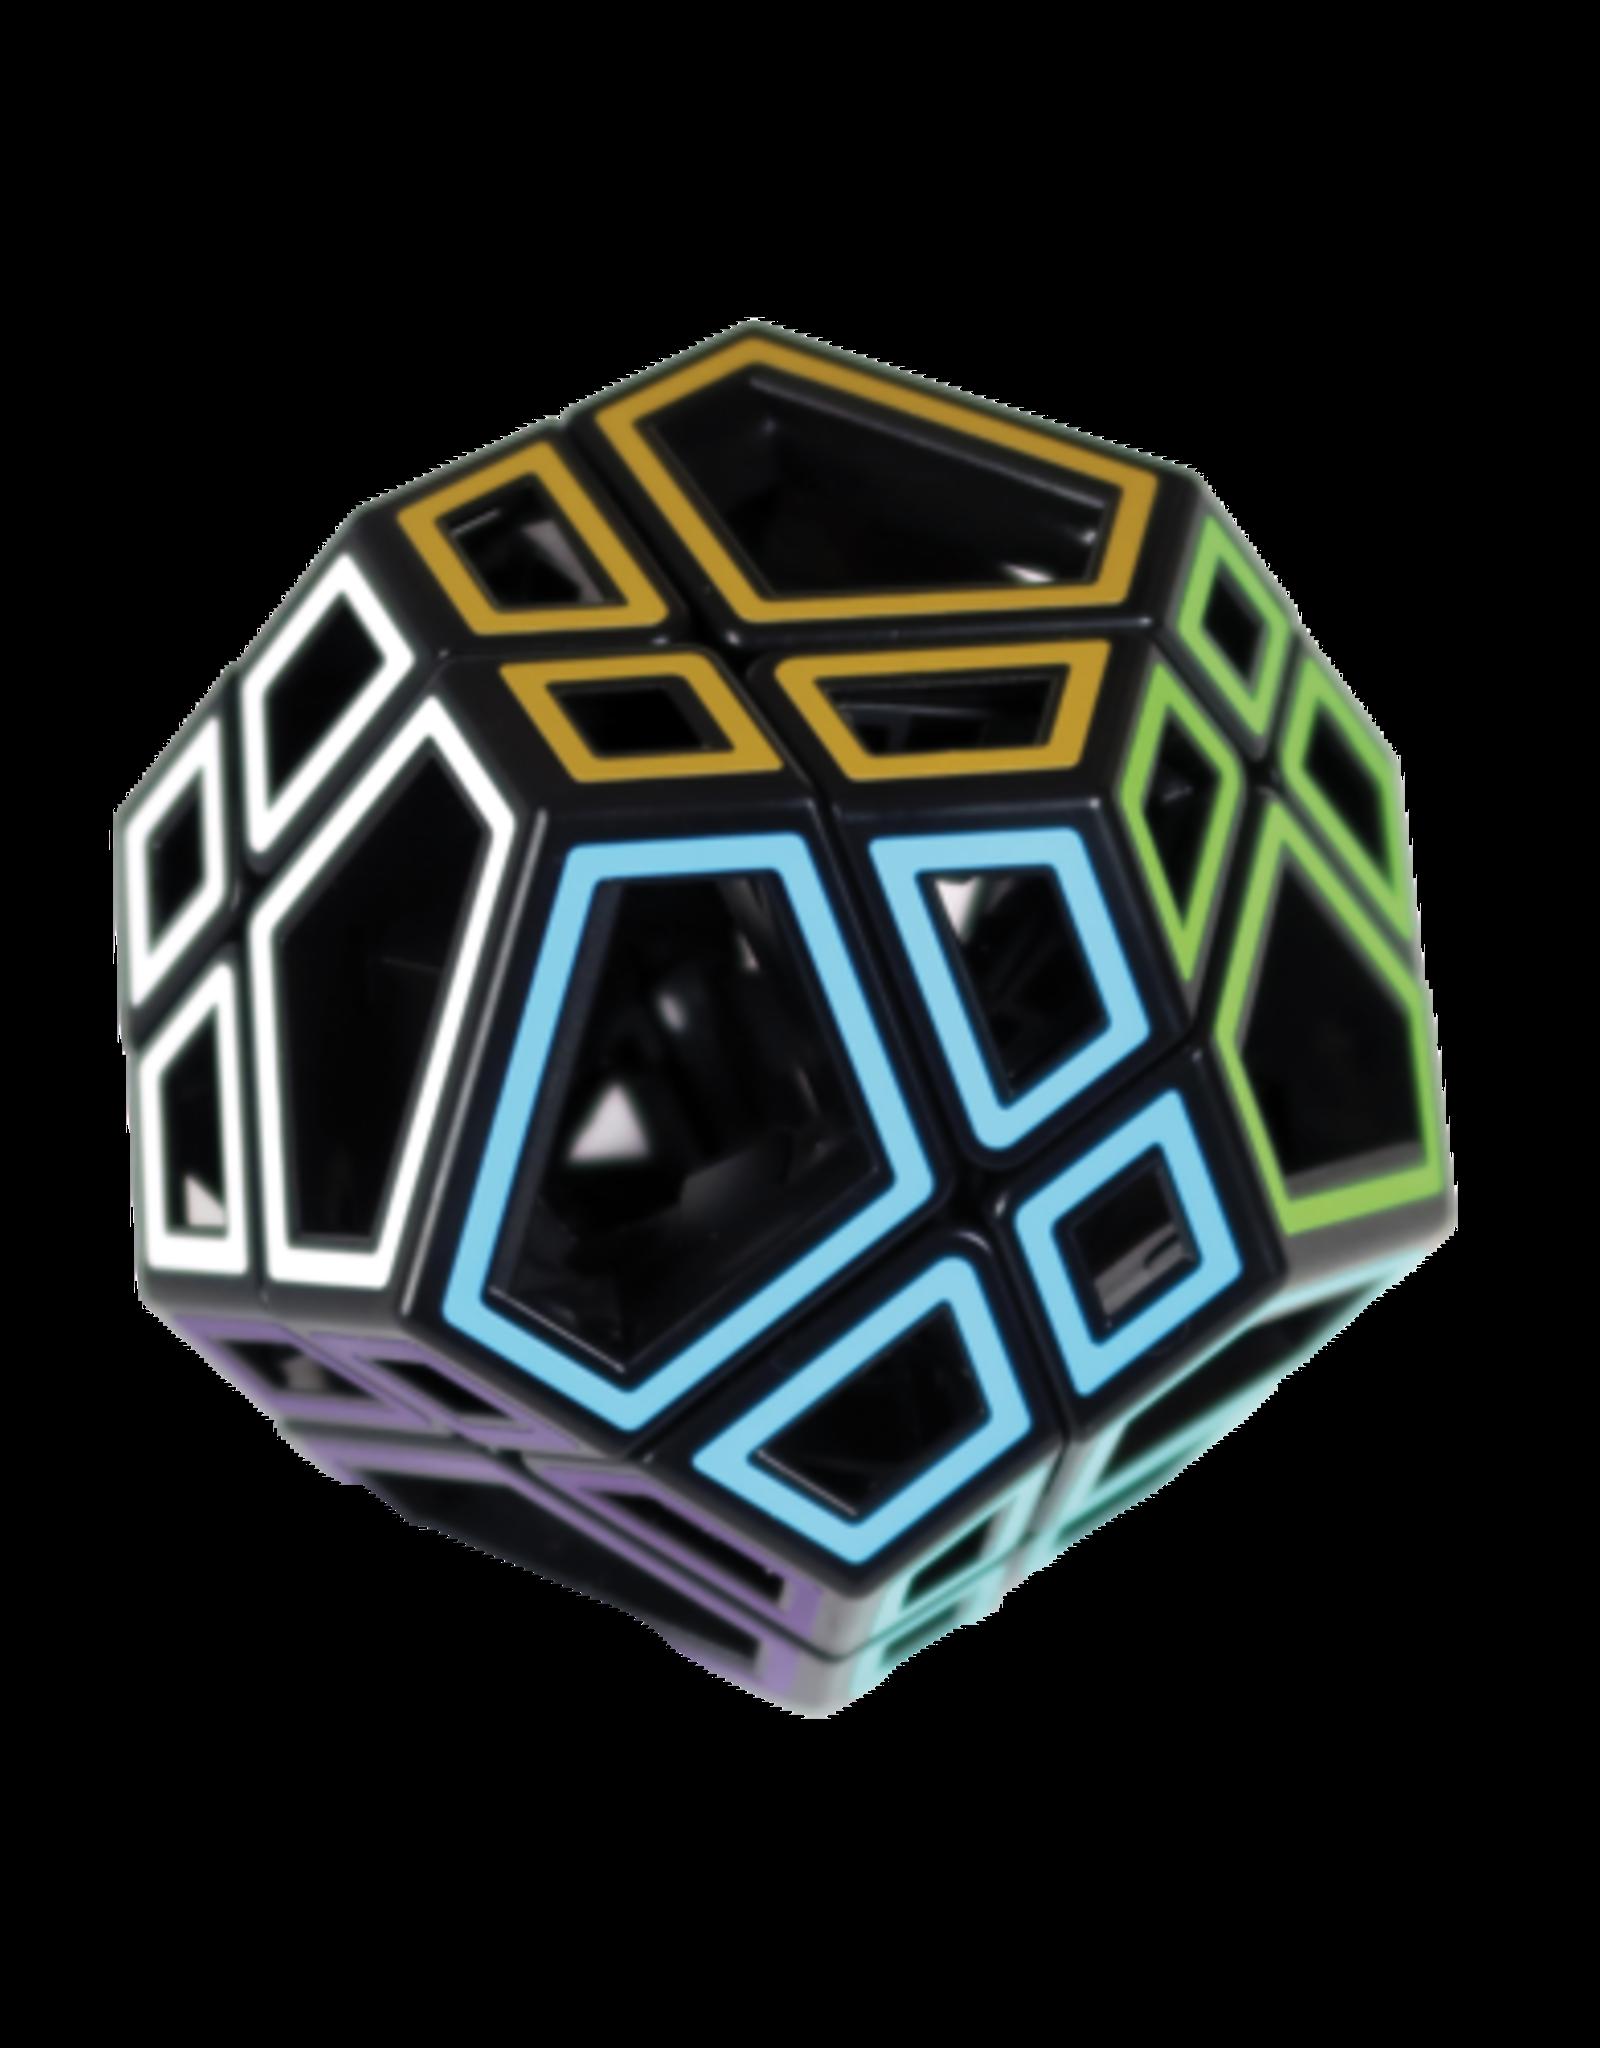 Meffert's Brainteaser Hollow Skewb Ultimate